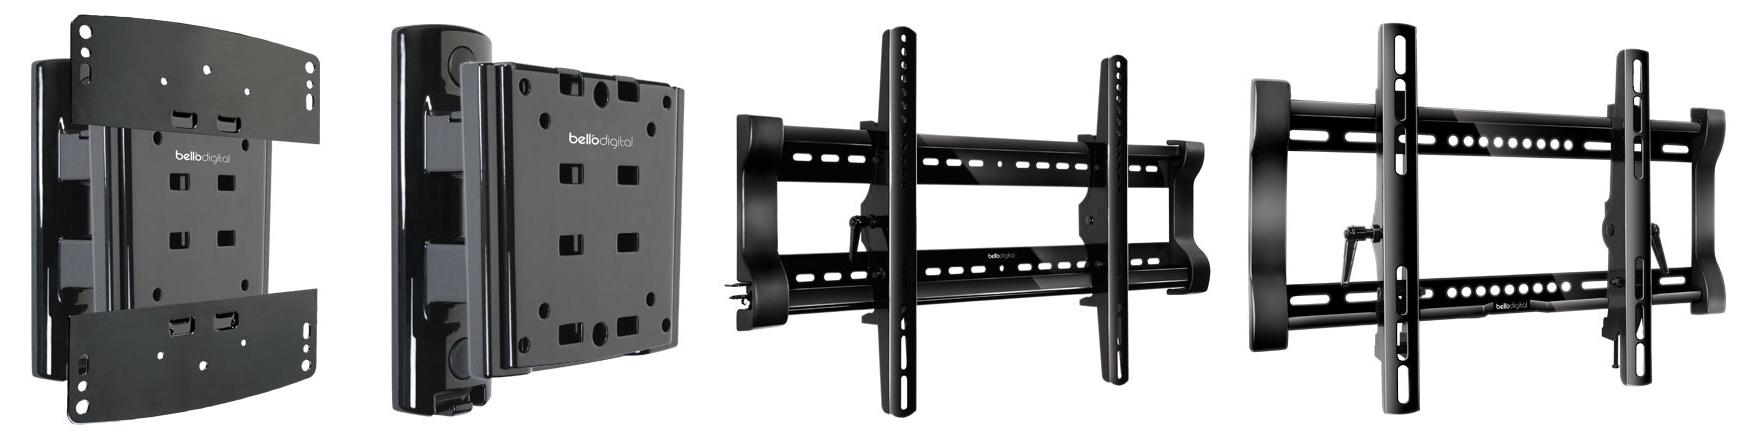 Production units ofBell'O wall mounts